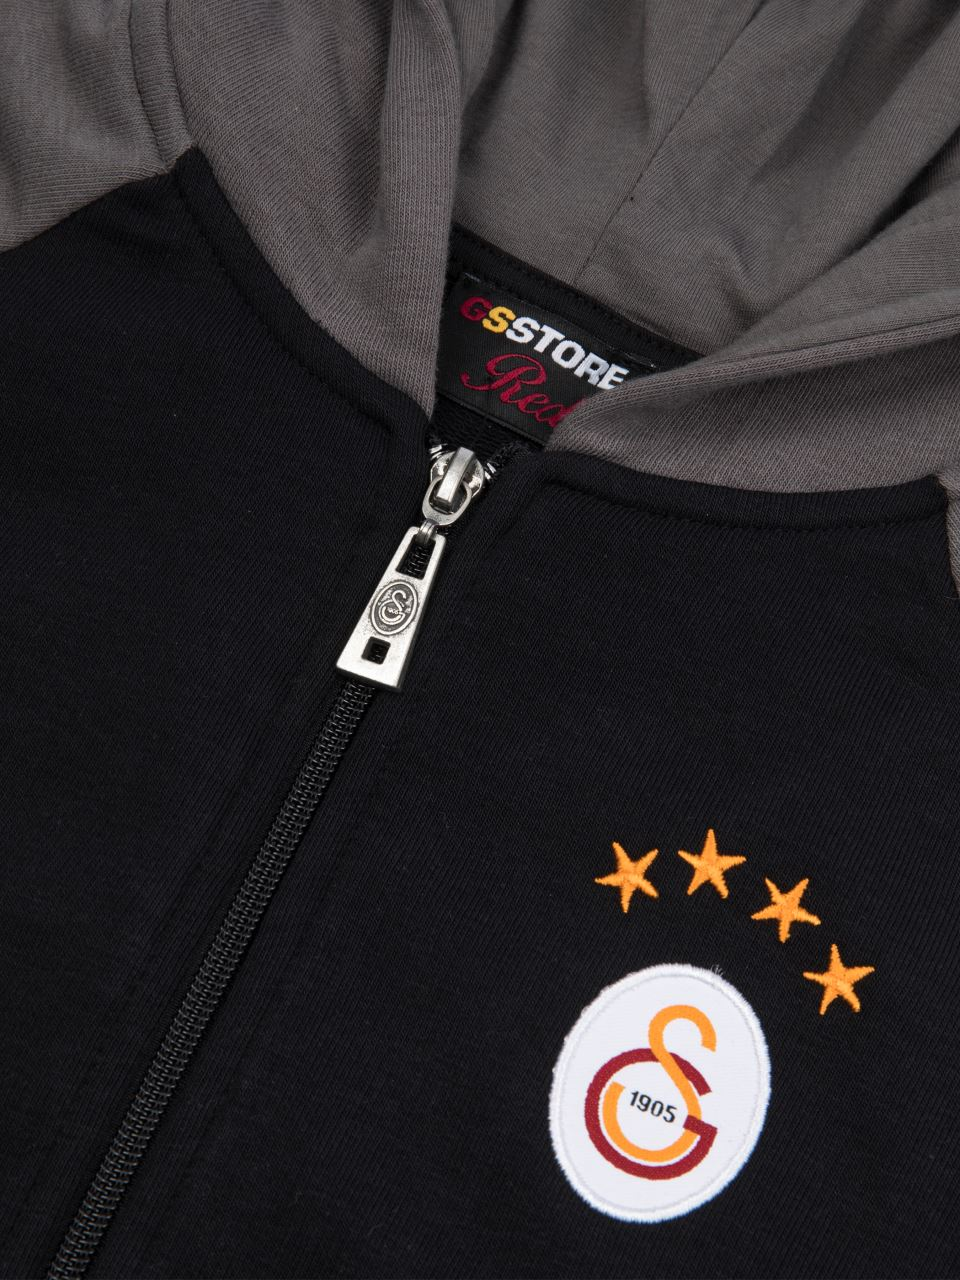 C85694 Sweatshirt_Try